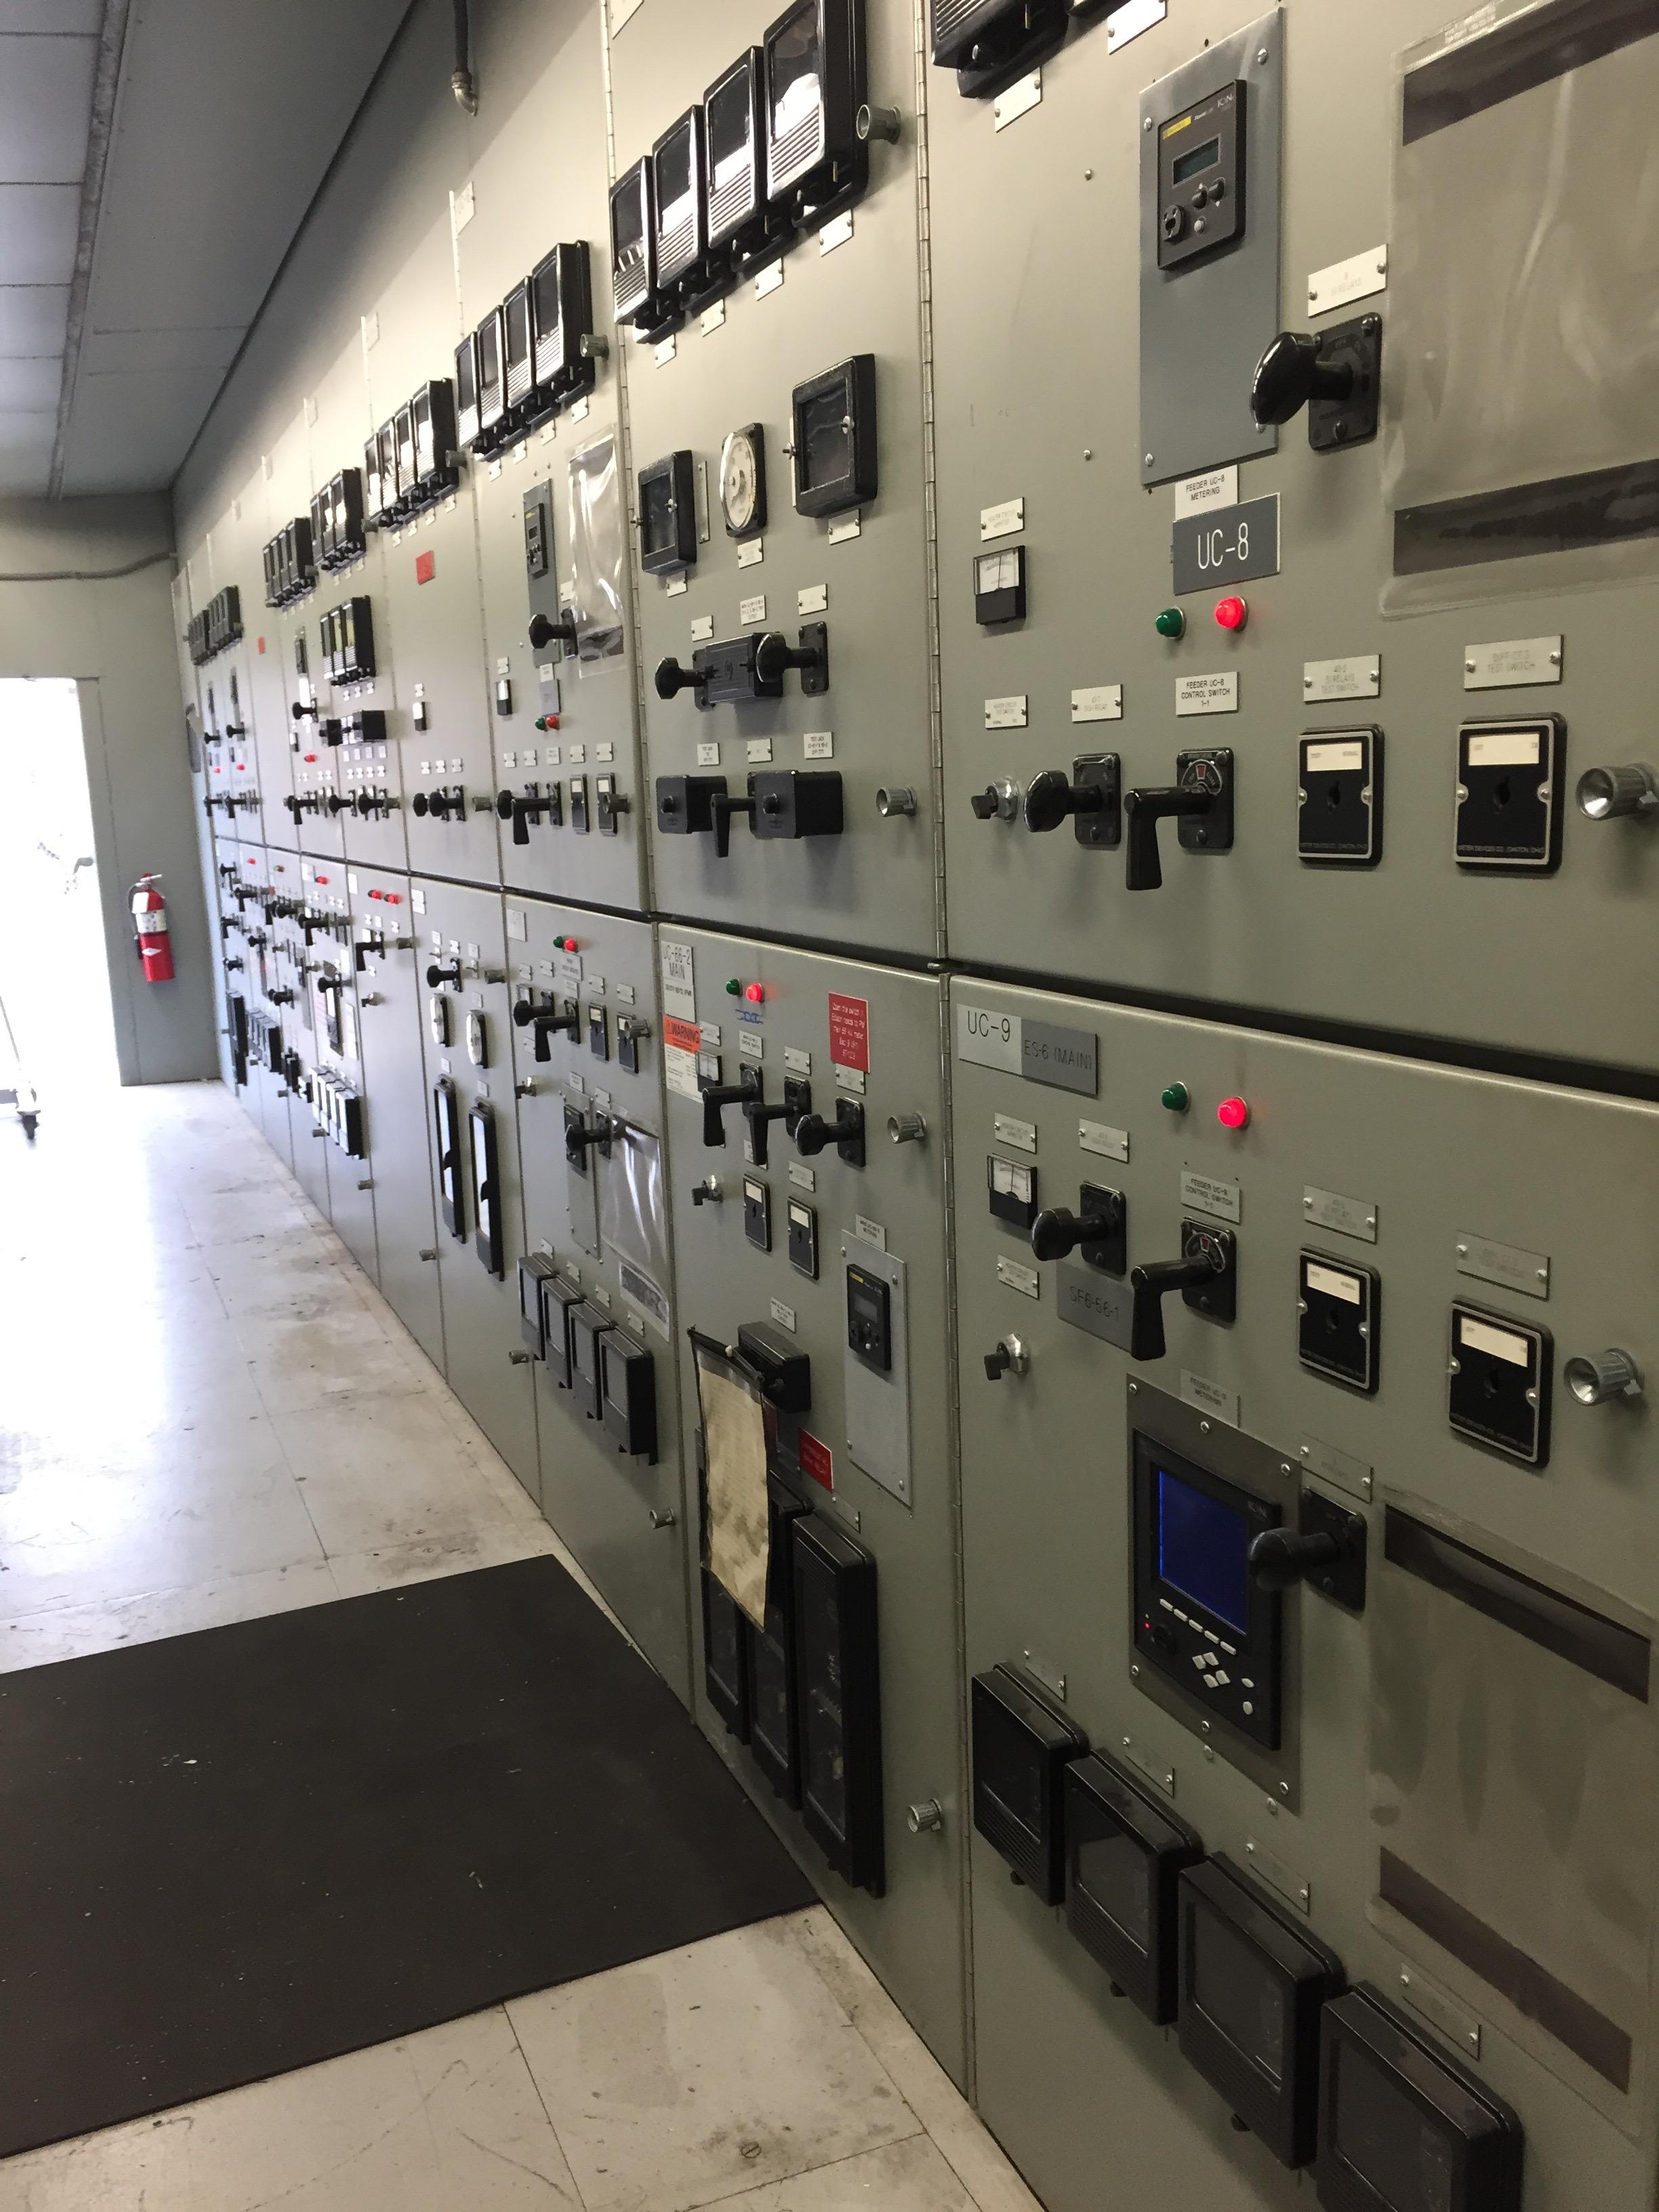 UCI Microgrid Substation